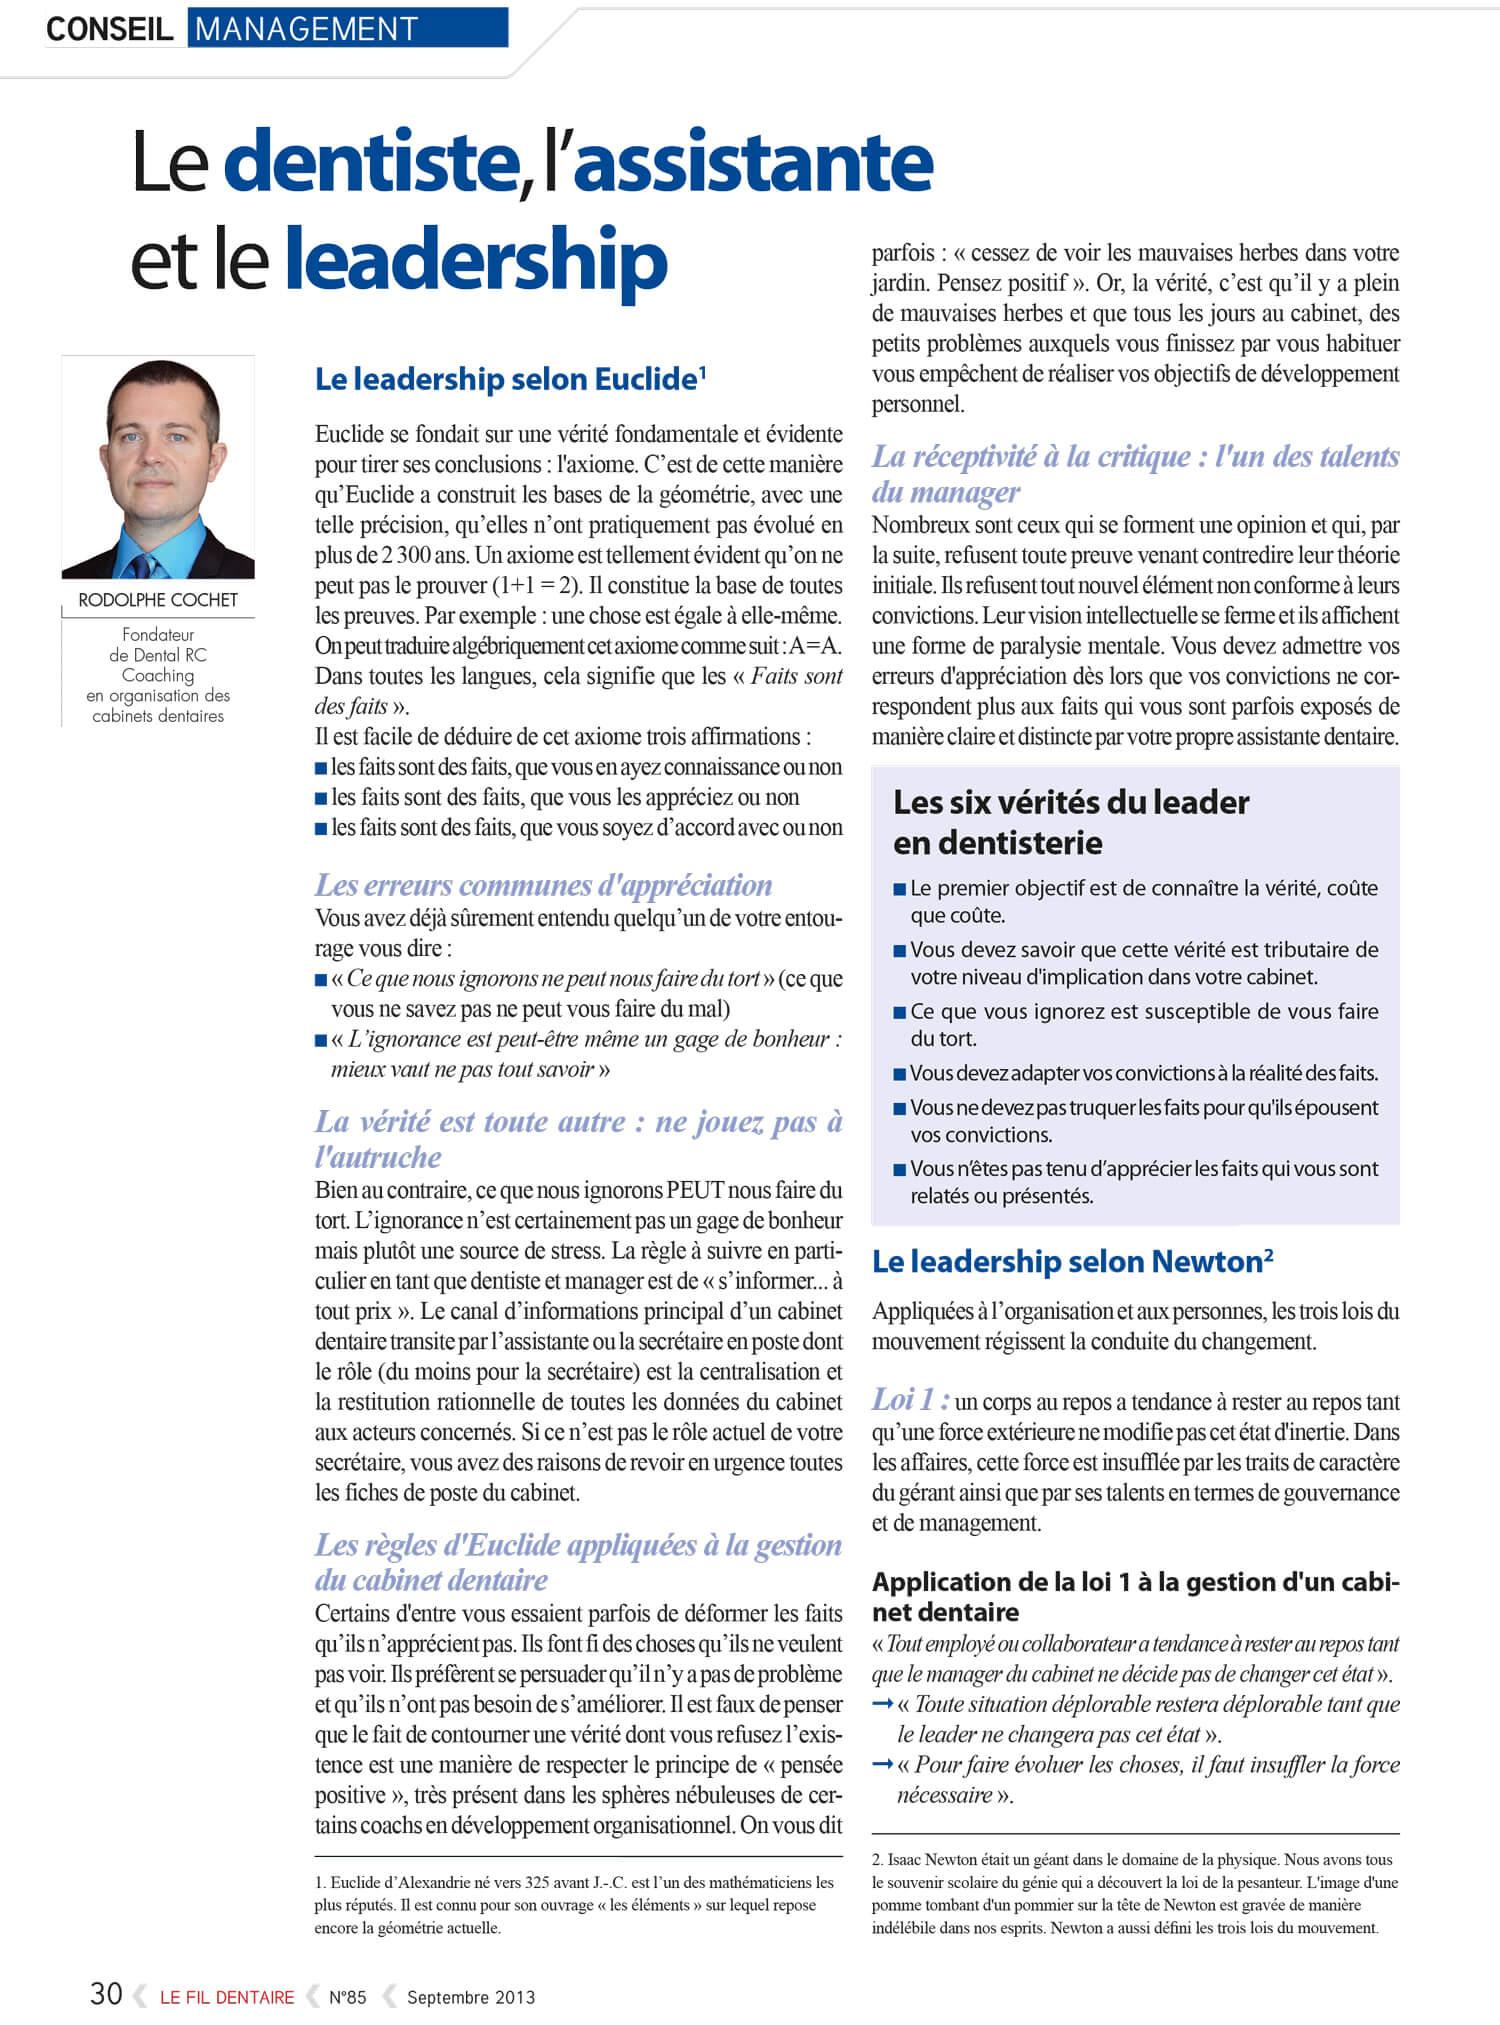 dentiste-assistante-dentaire-leadership-gestion-management-cabinet-Rodolphe-Cochet.jpg